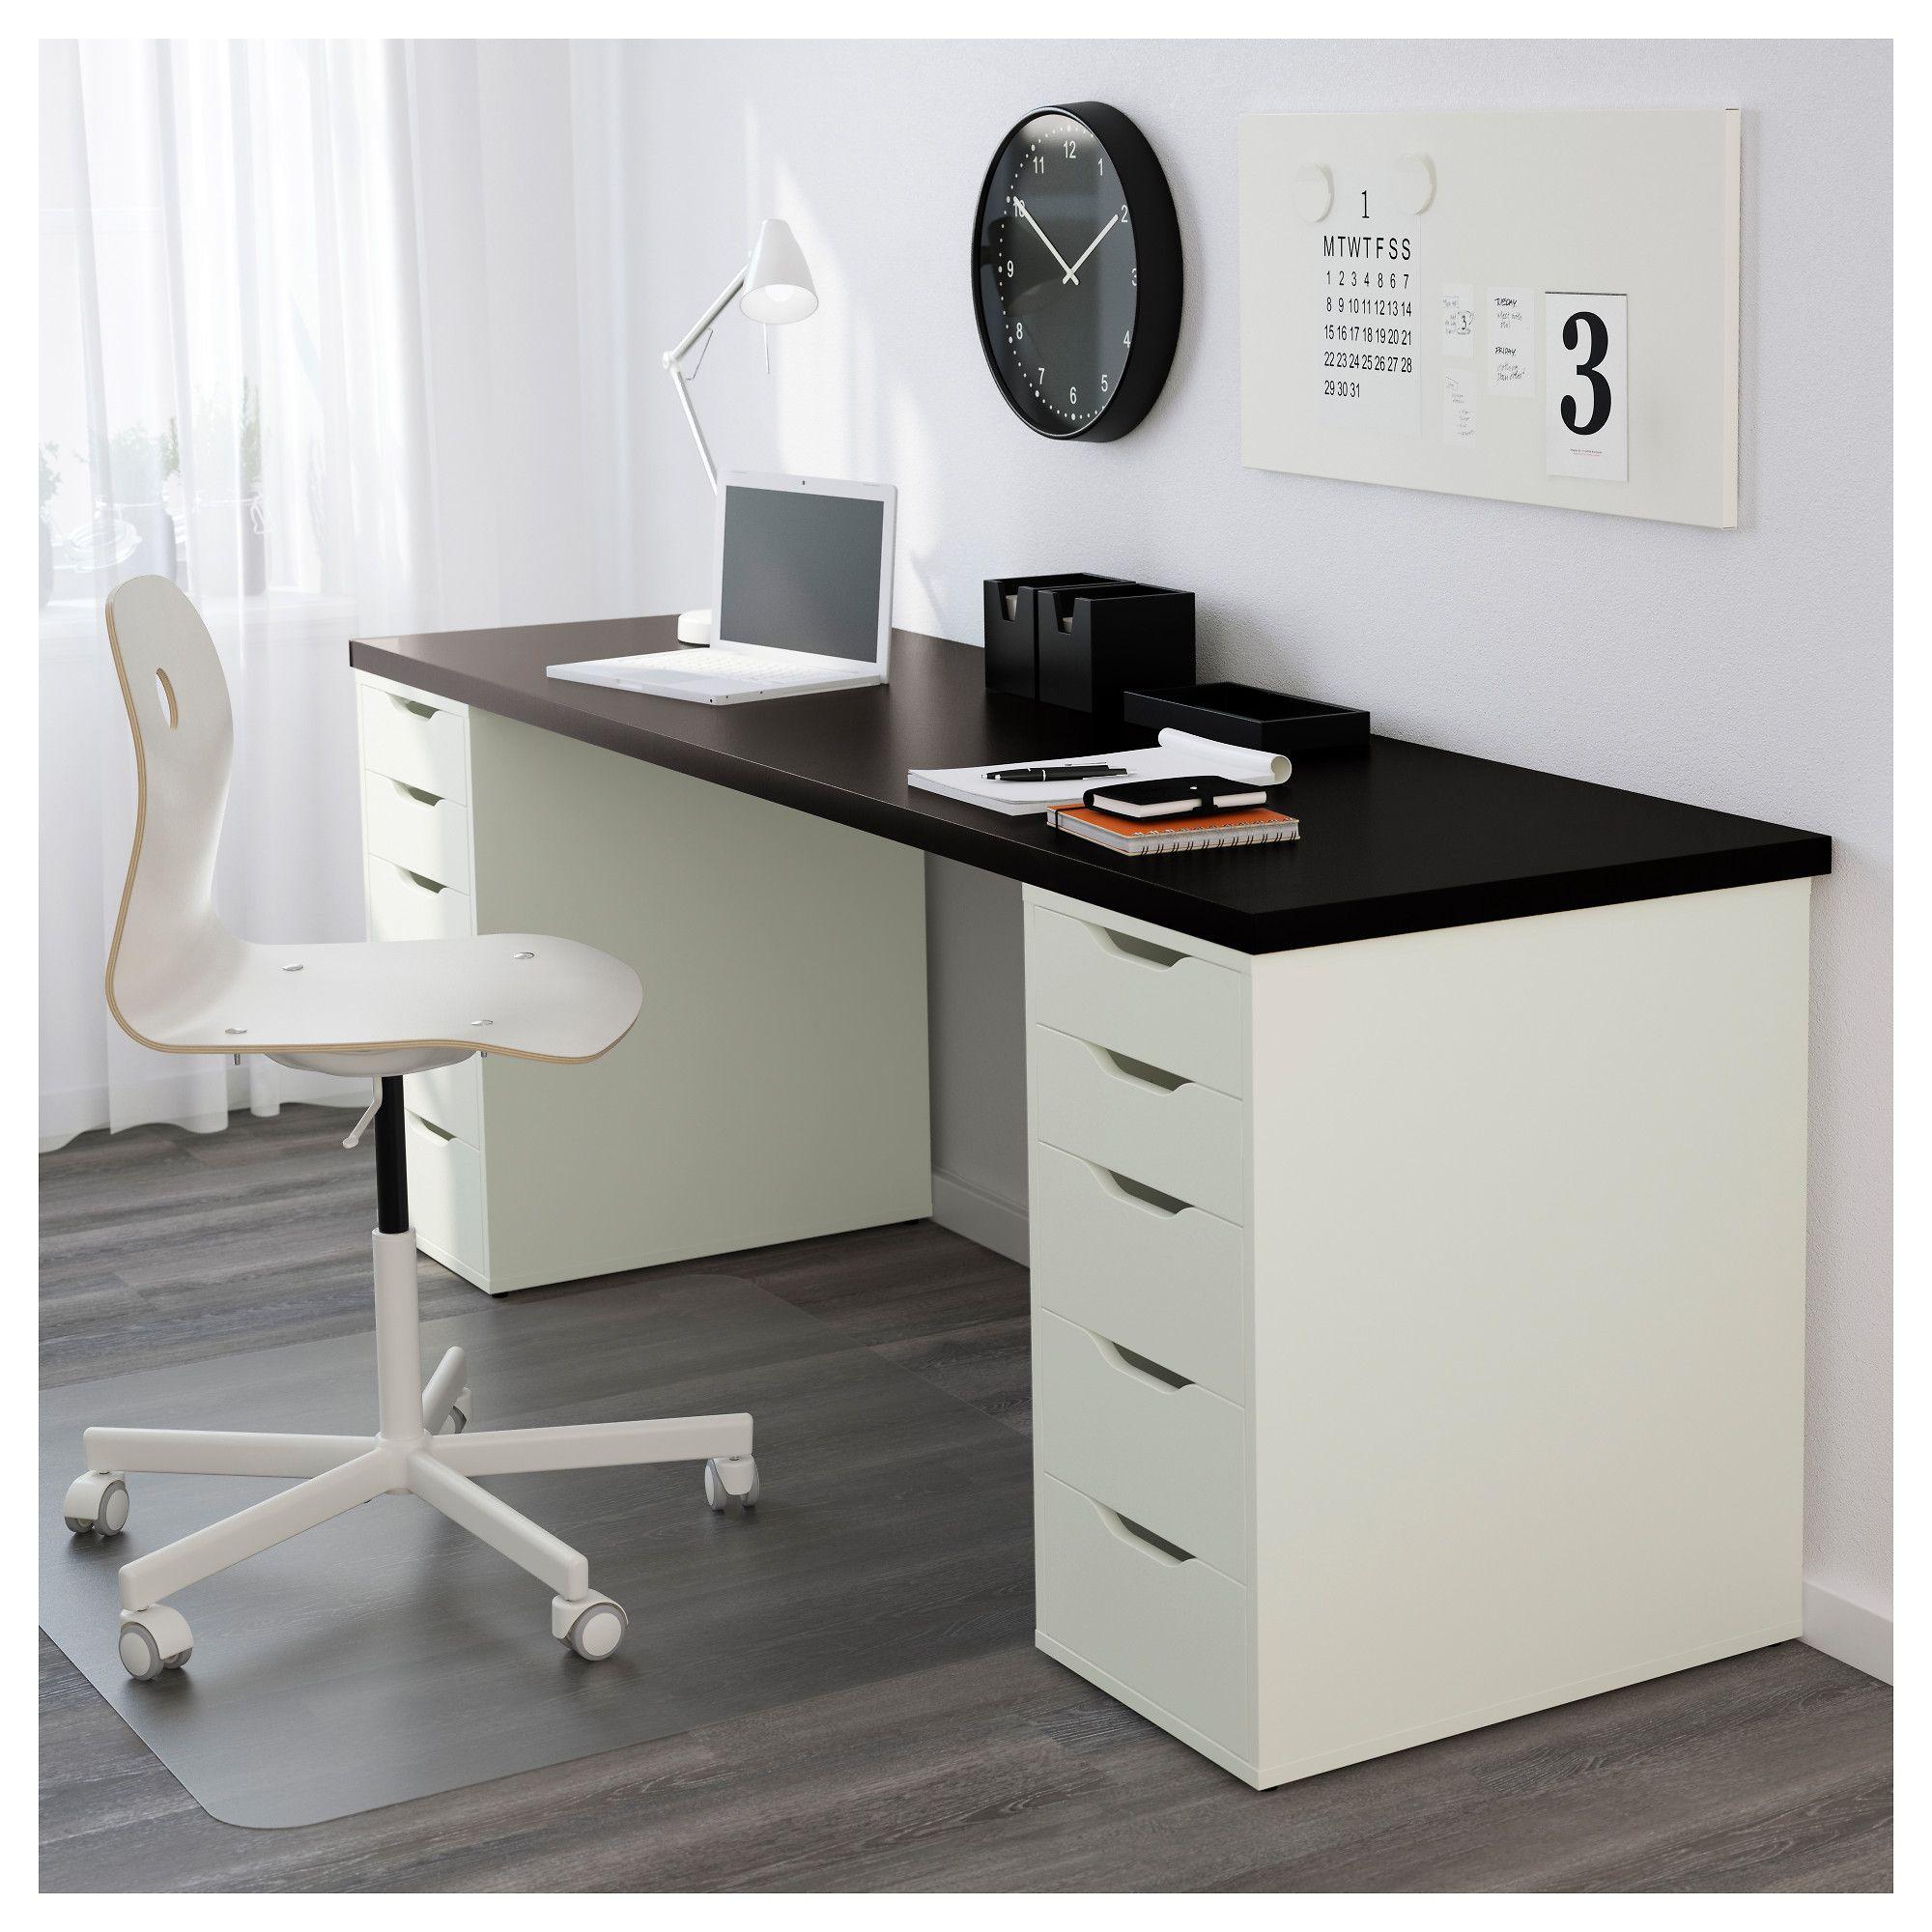 Table Linnmon Alex Black Brown White Renos Decoration Caisson A Tiroirs Tiroir Et Bureau Blanc Ikea